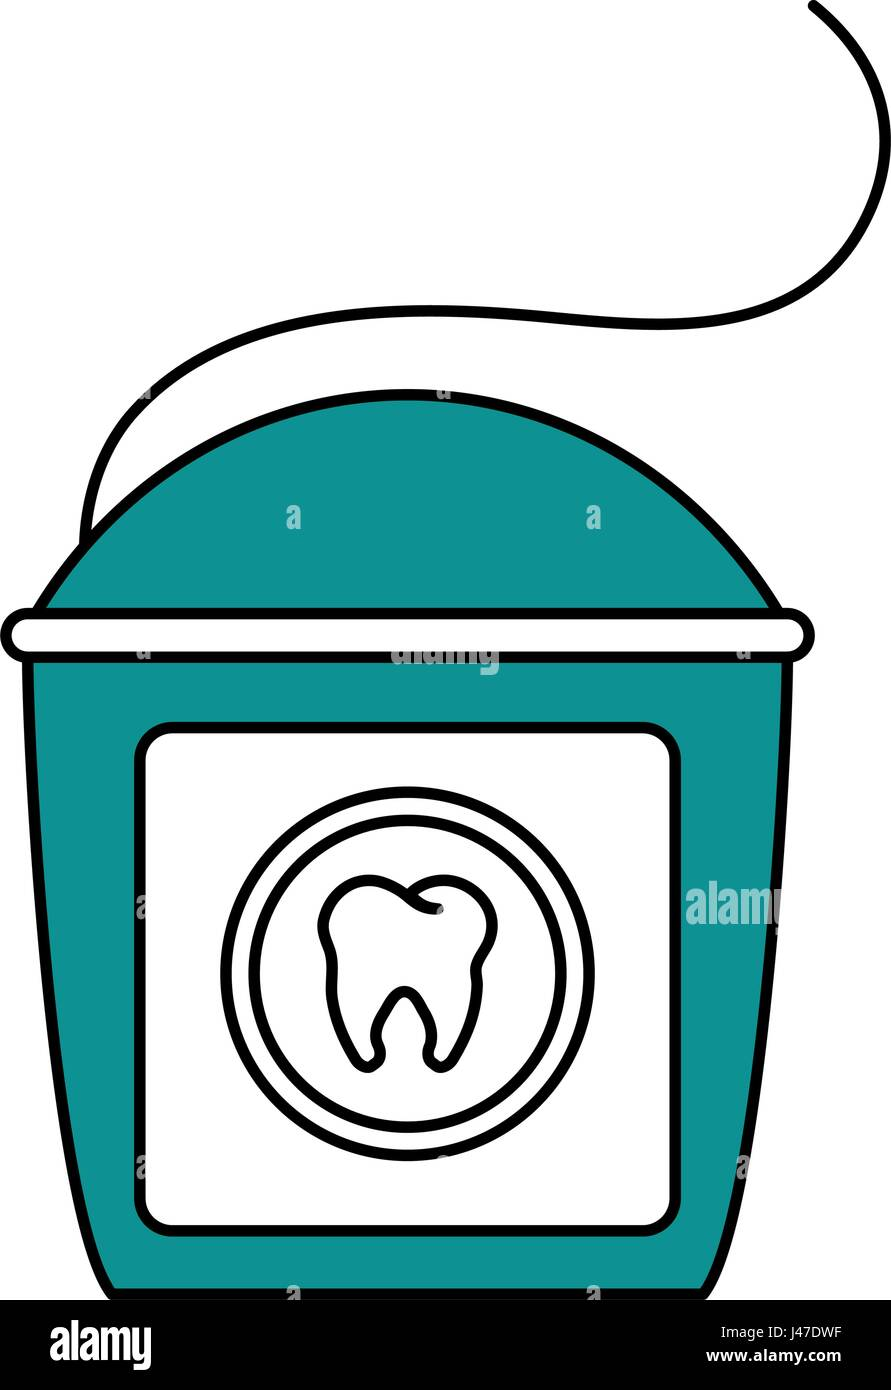 Color Silhouette Cartoon Dental Floss For Oral Health